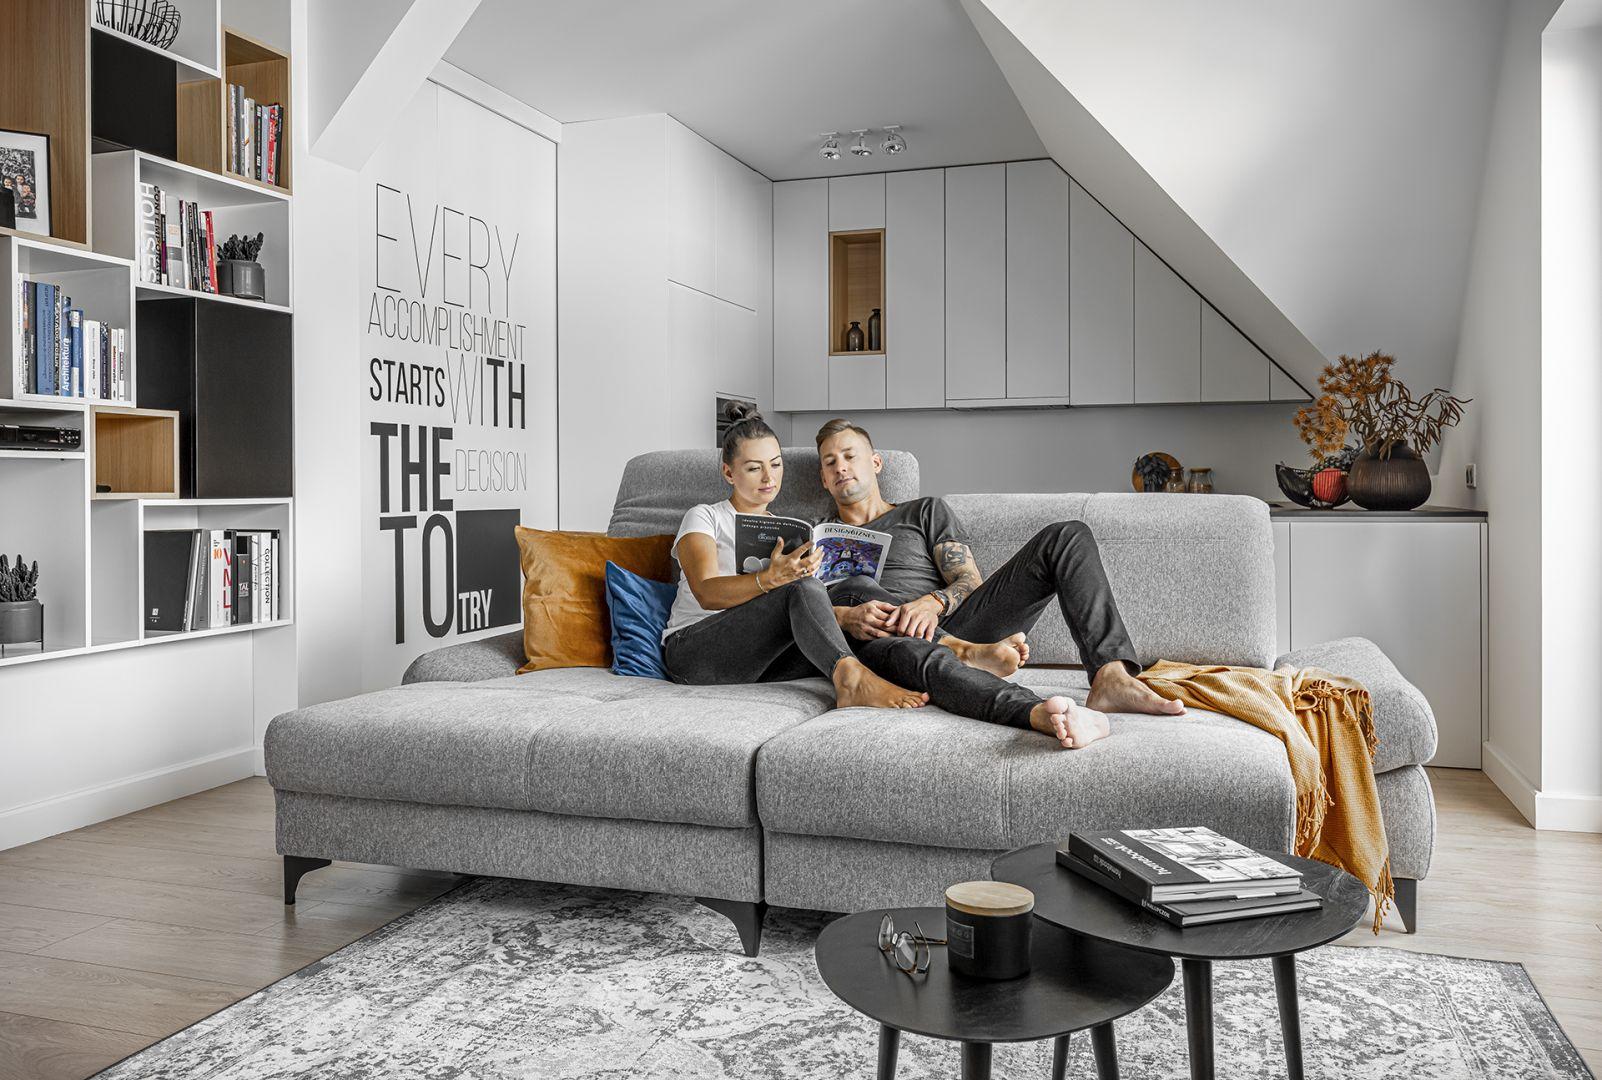 Sofa Carmen z oferty marki Meble Wajnert. Fot. WAJNERT